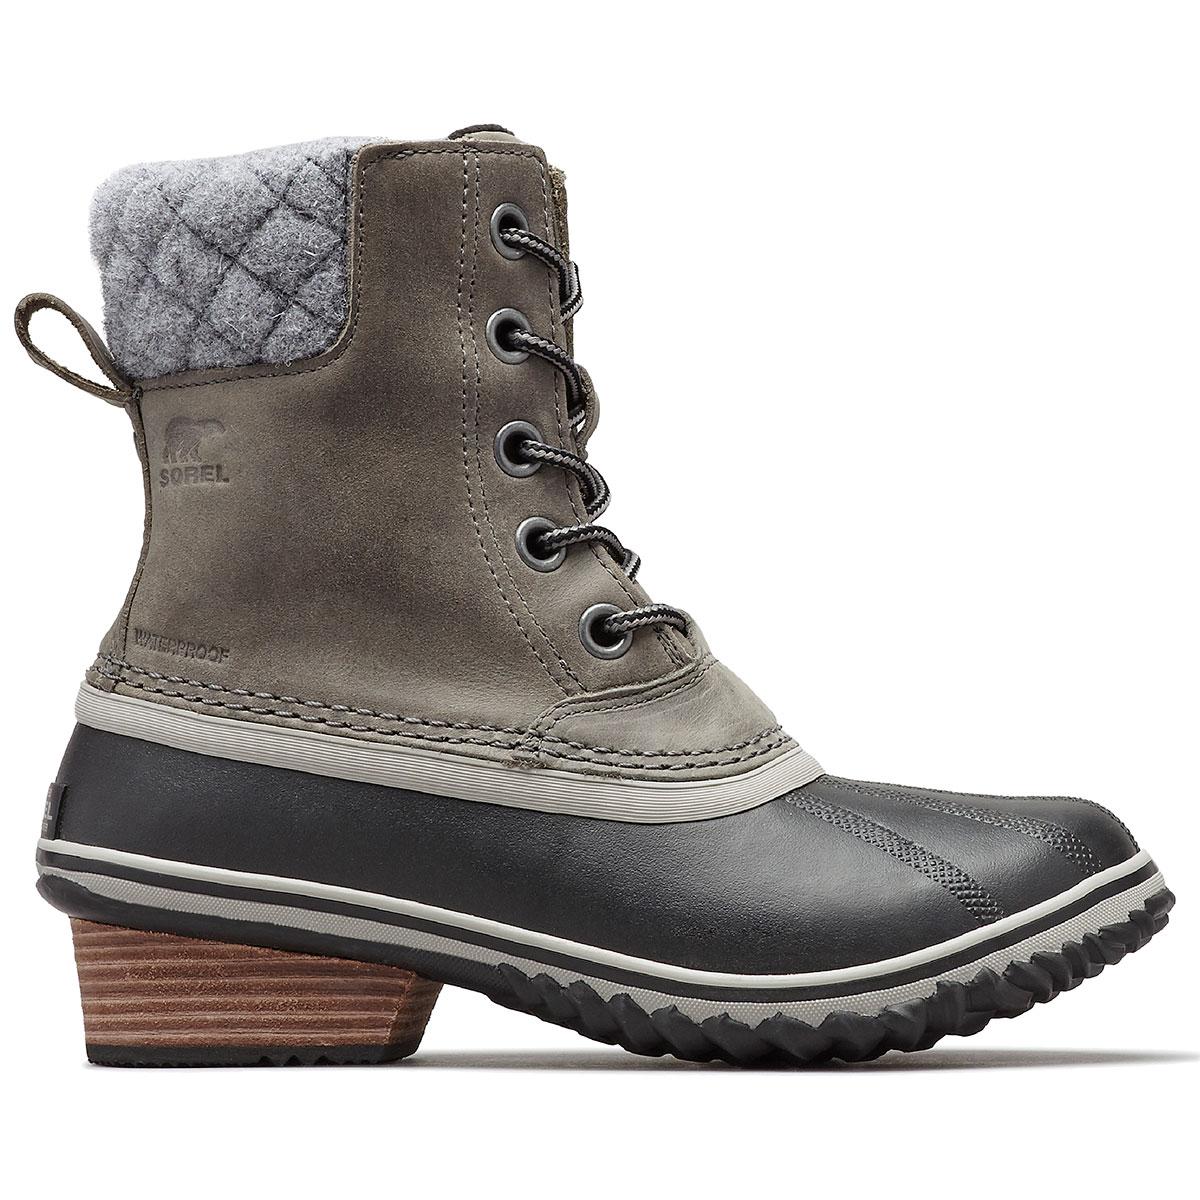 Sorel Women's Slimpack Ii Lace Boots, Elk - Black, 8